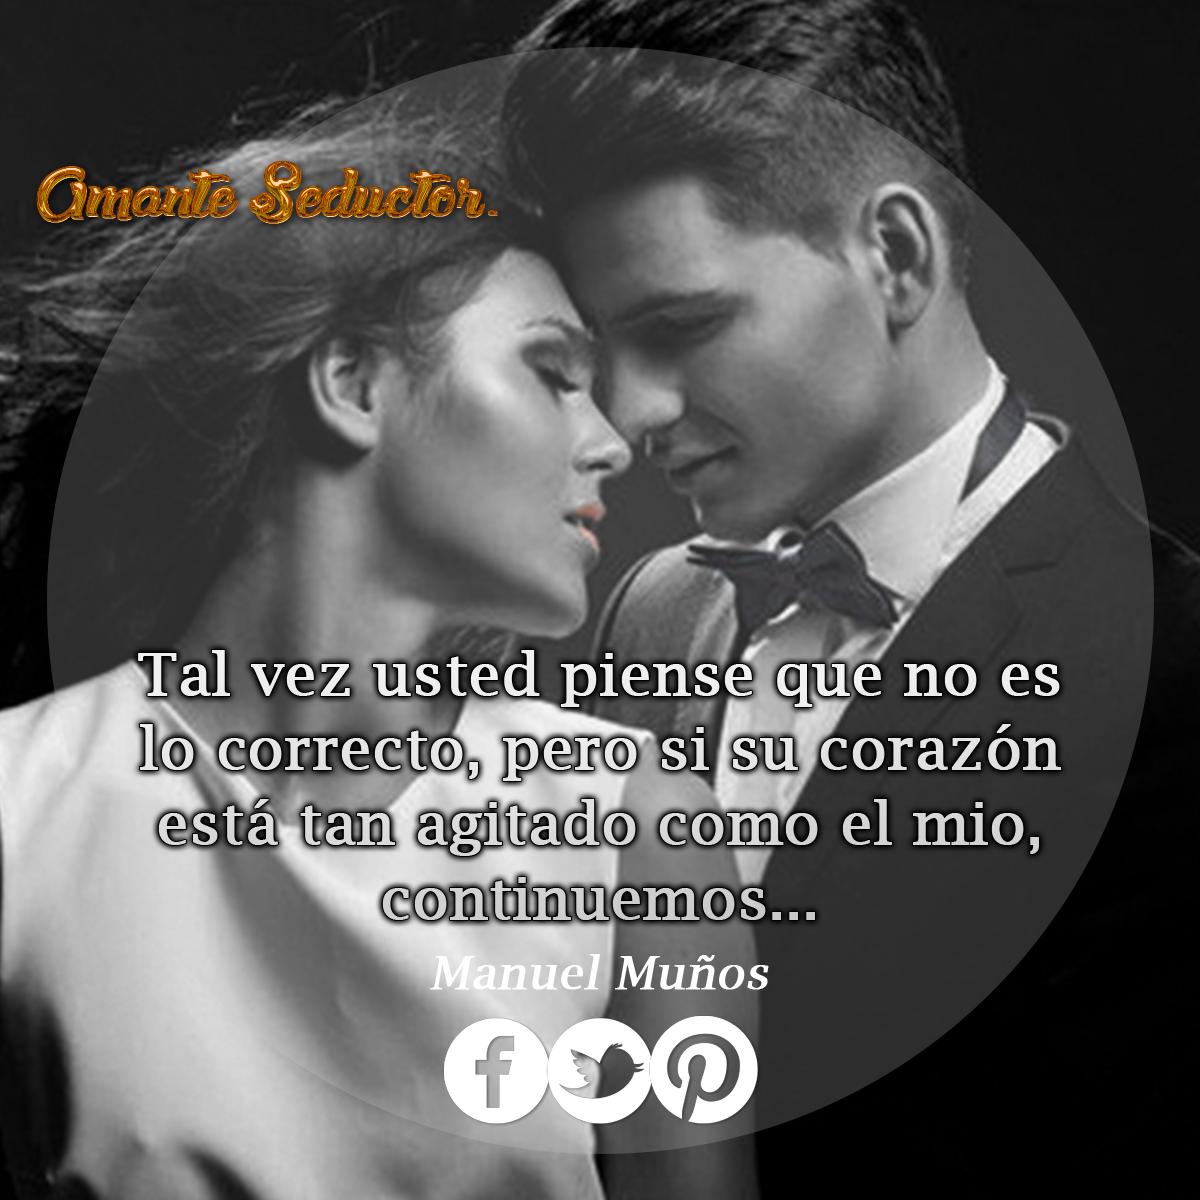 Amanteseductor Frases De Amor Prohibido Beso Frasescelebres